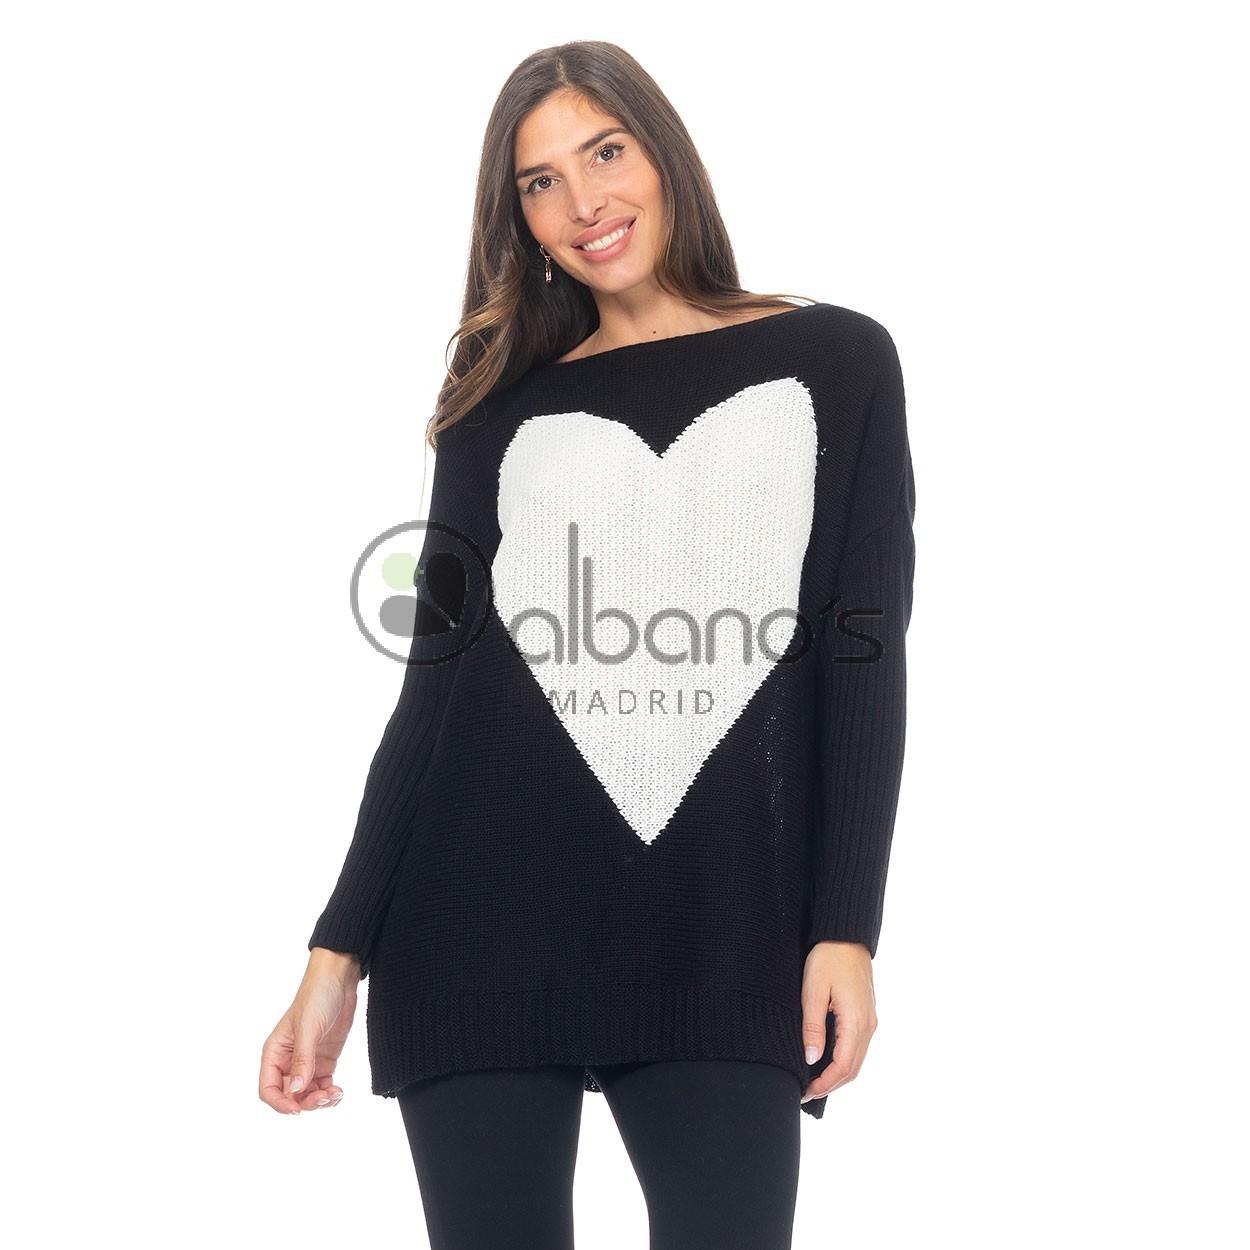 MALHA ALBANO'S